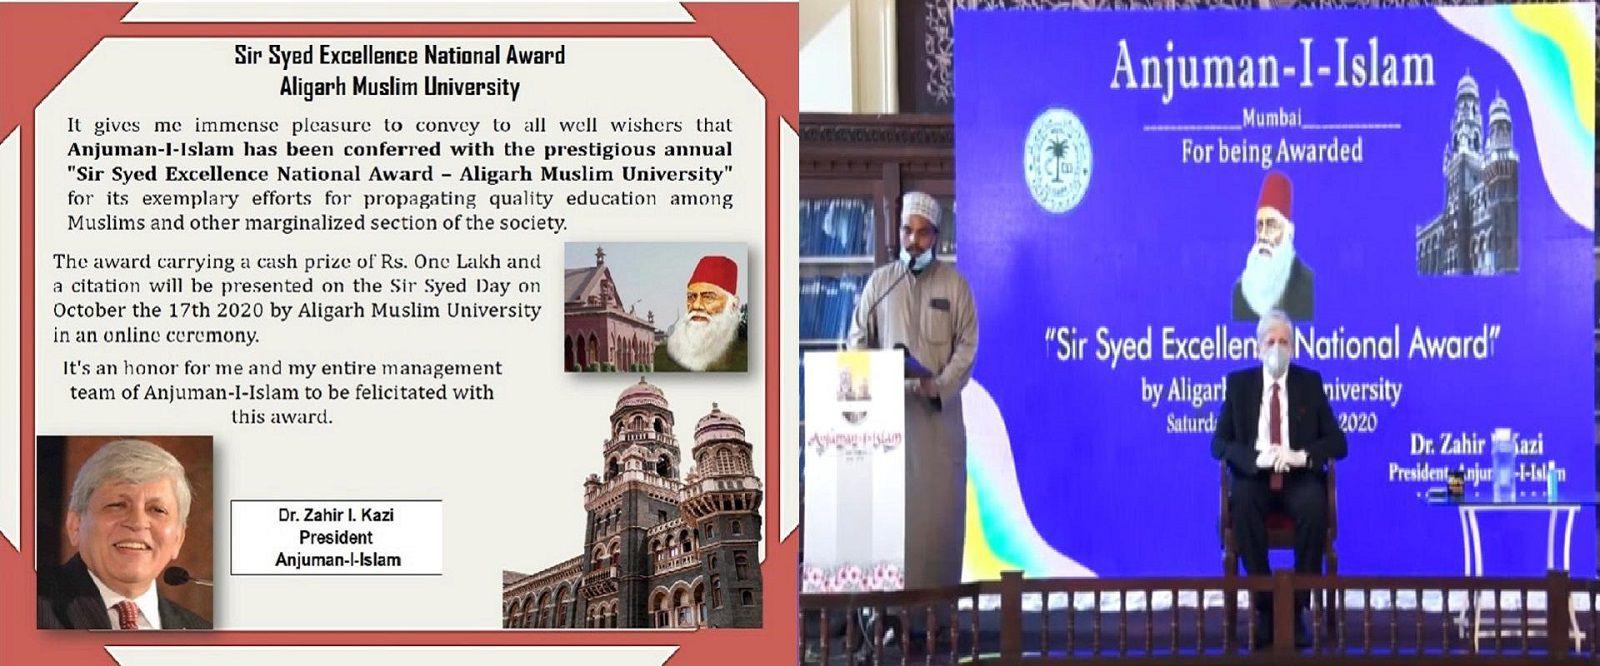 Sir-Sayed-Award-banner